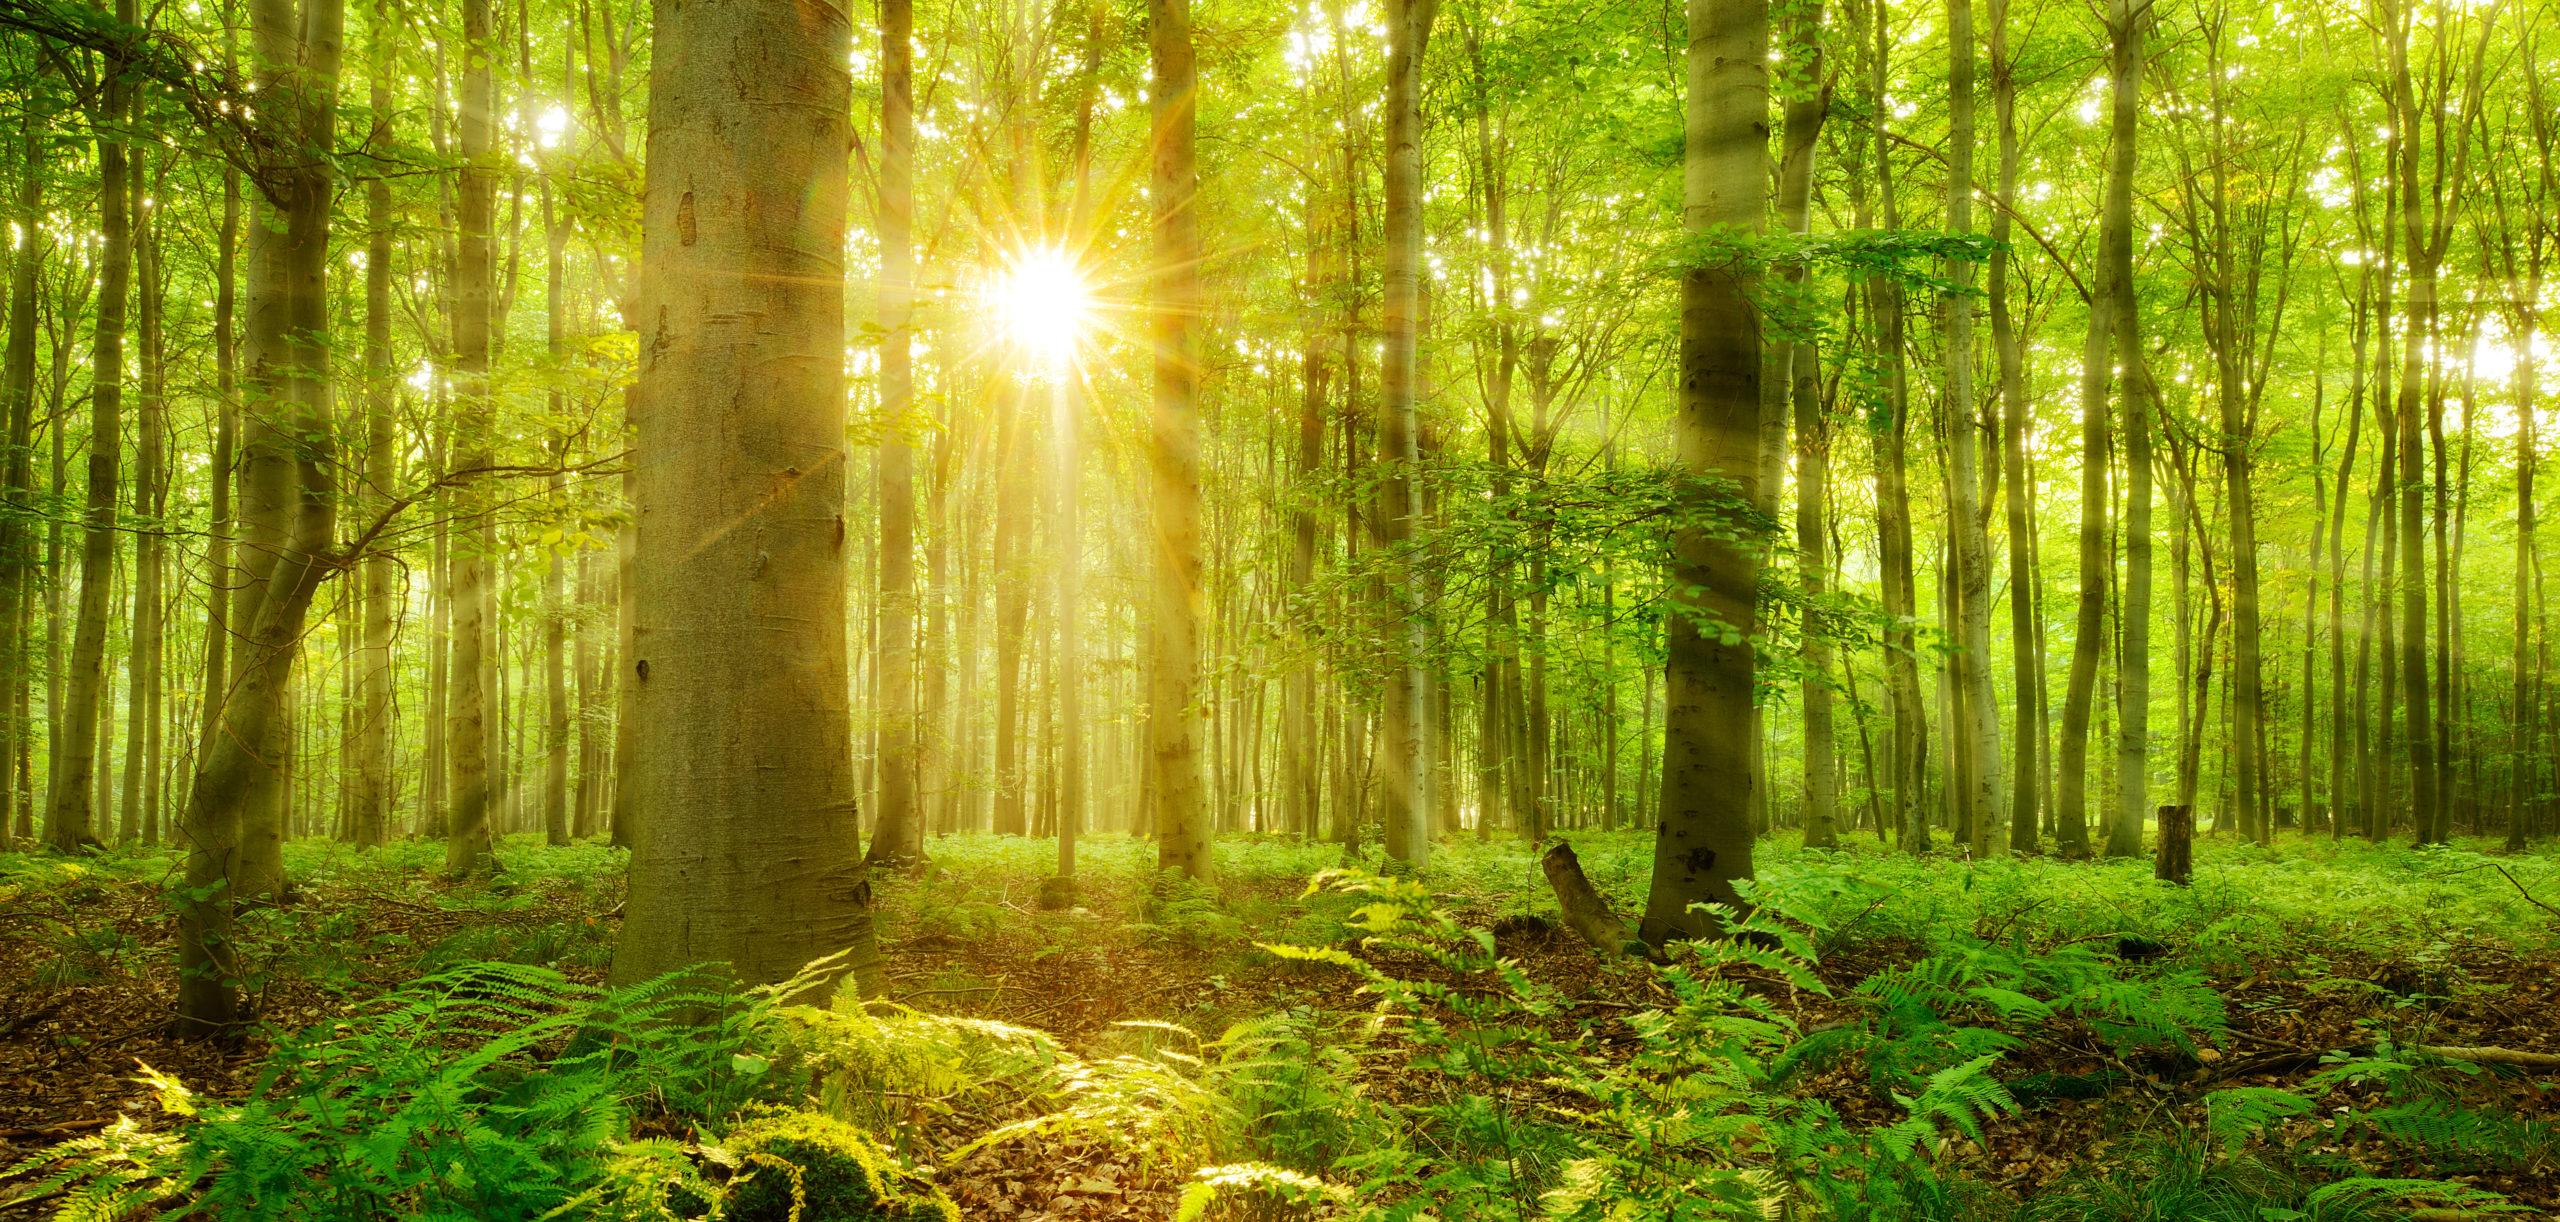 Opinión: Un lugar para conectar con la naturaleza